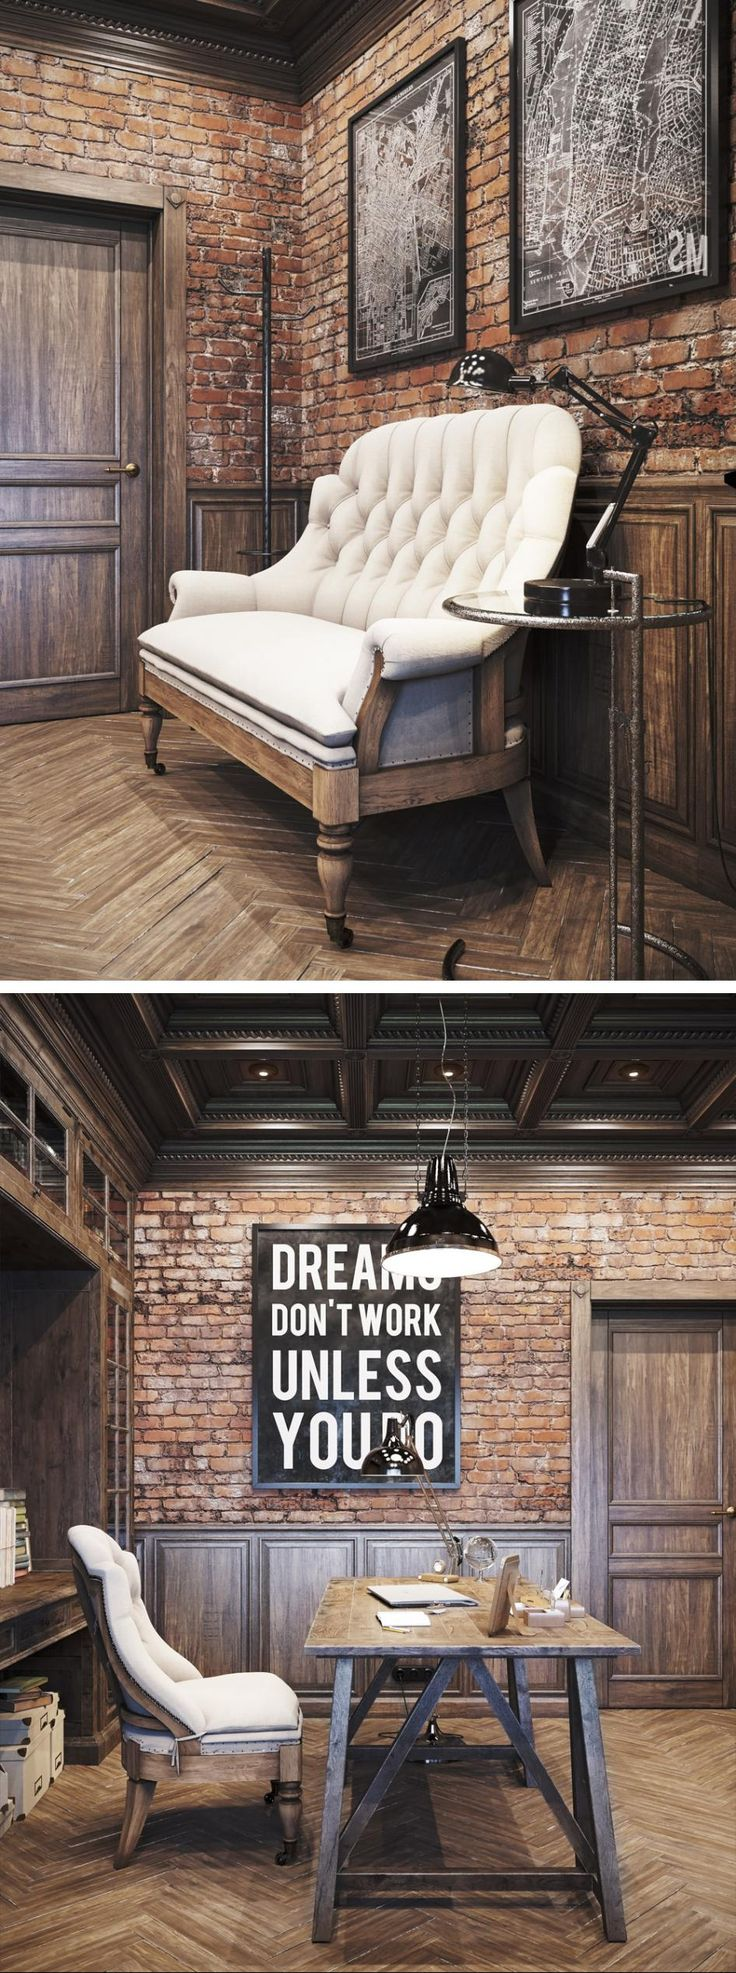 Vintage working room - Галерея 3ddd.ru